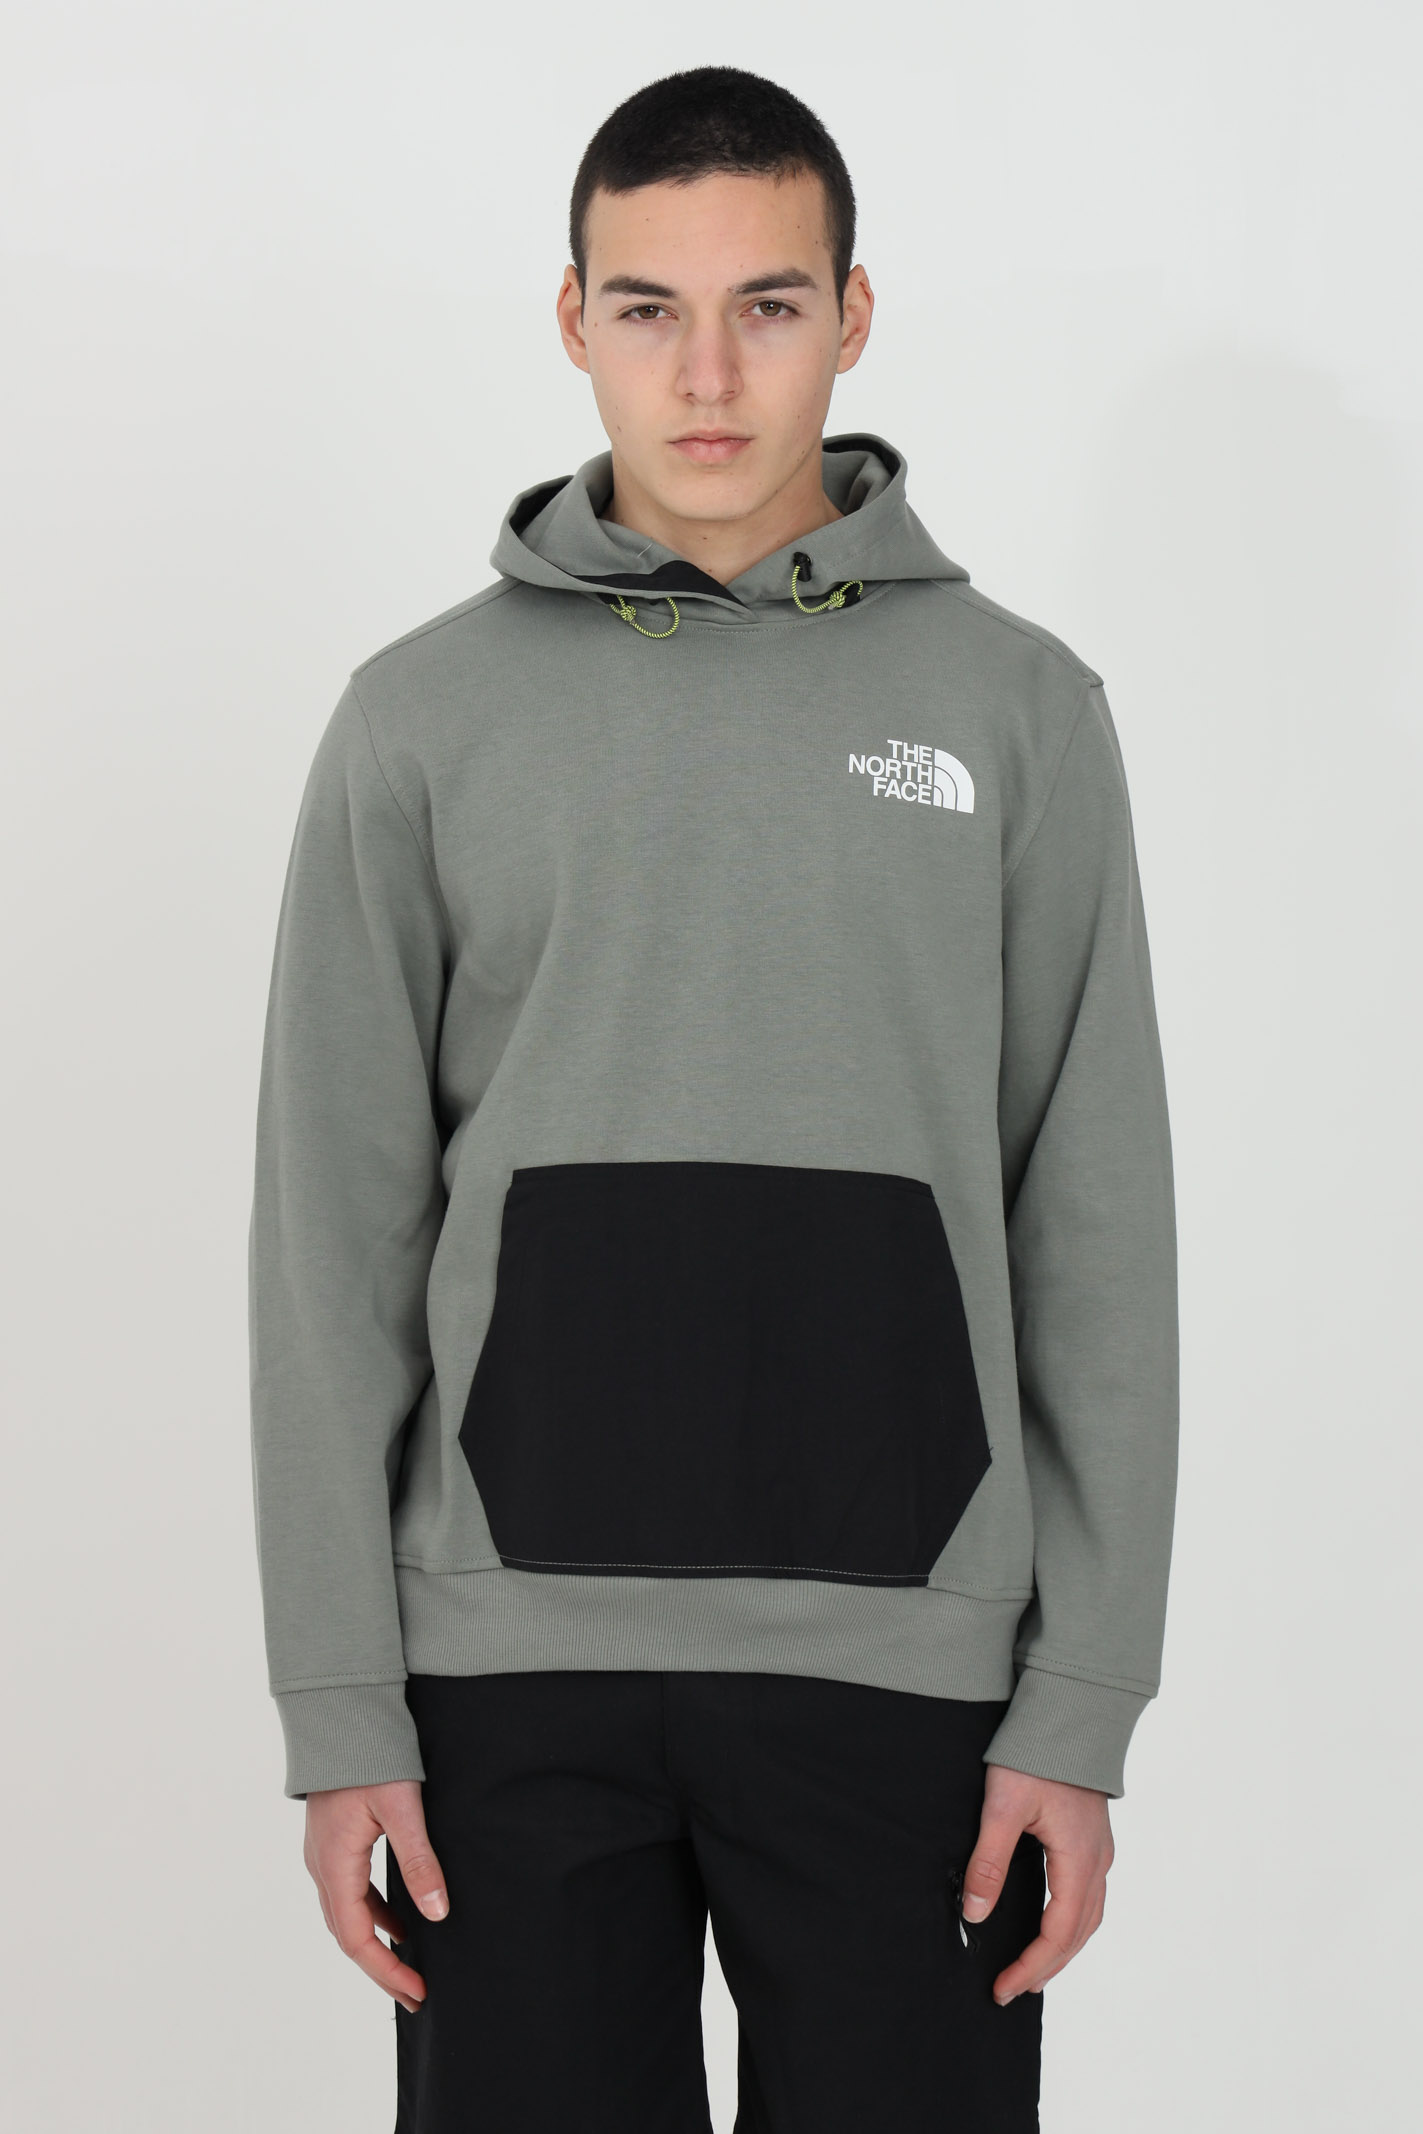 THE NORTH FACE | Sweatshirt | NF0A5317V381V381